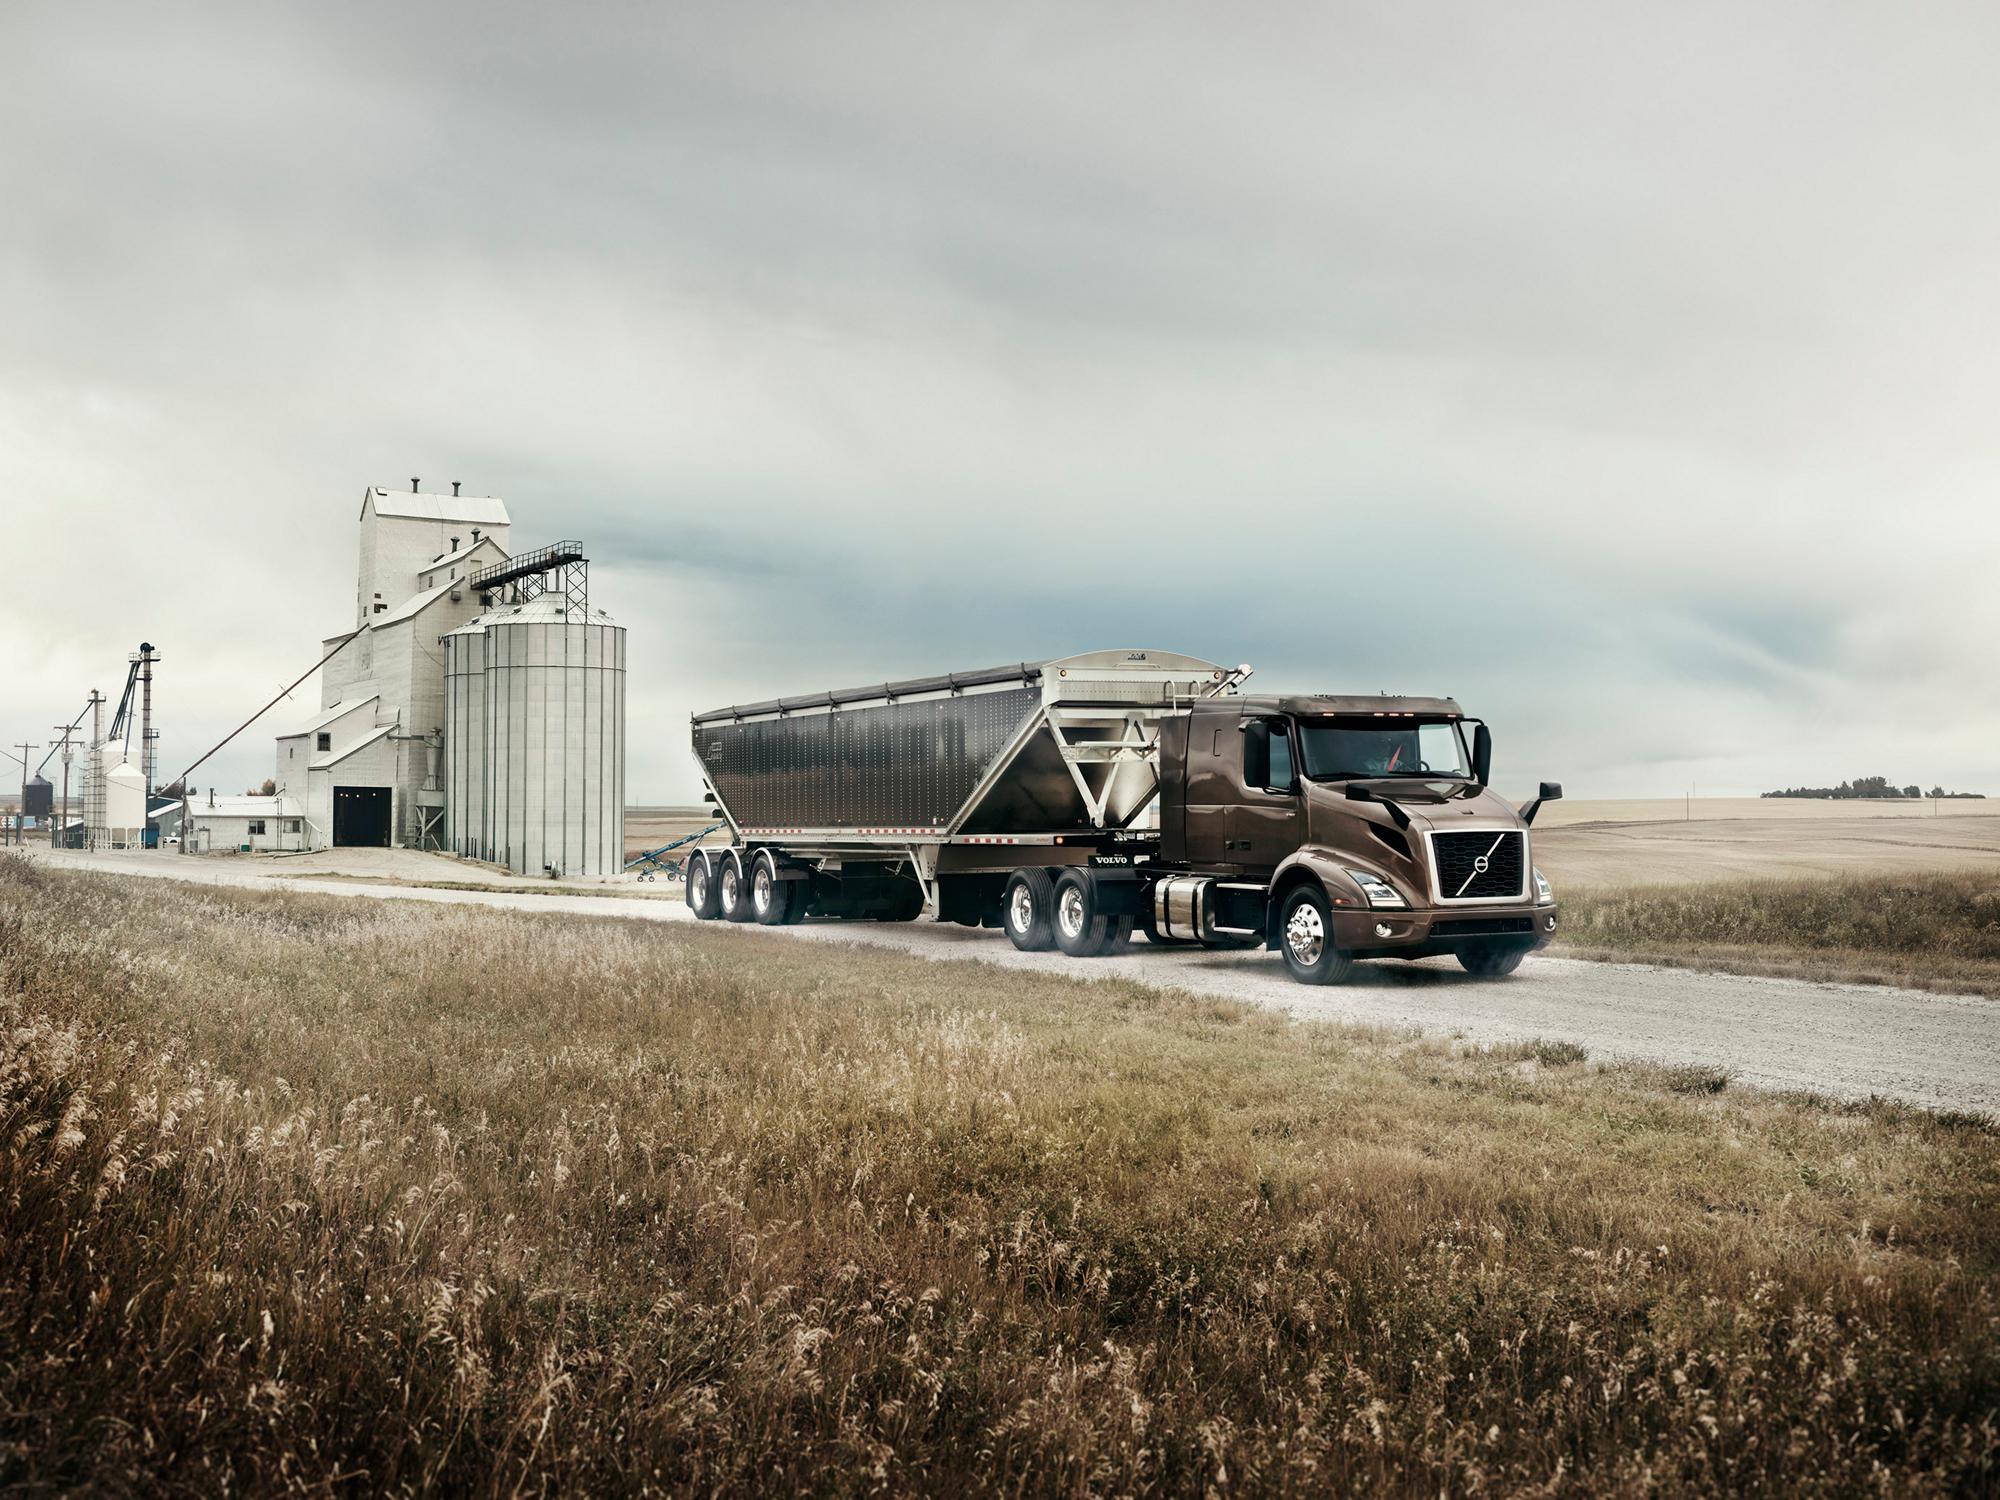 Volvo debuts new VNR regional truck at ExpoCam - Truck News